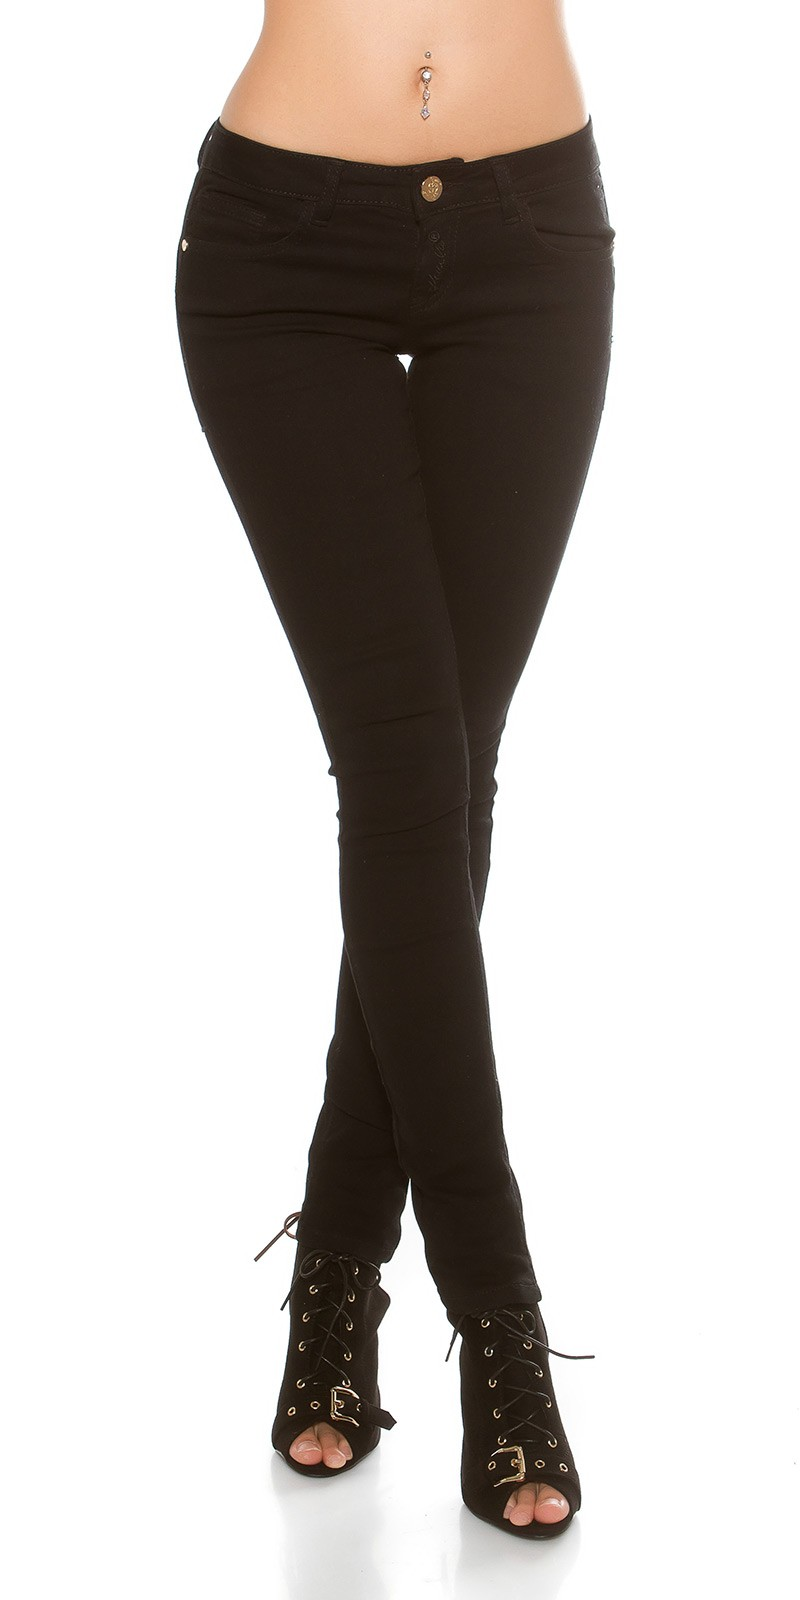 f6bb5fc511 Fűzős push up skinny női farmer - Fekete (38) | Mysticfashion női ...